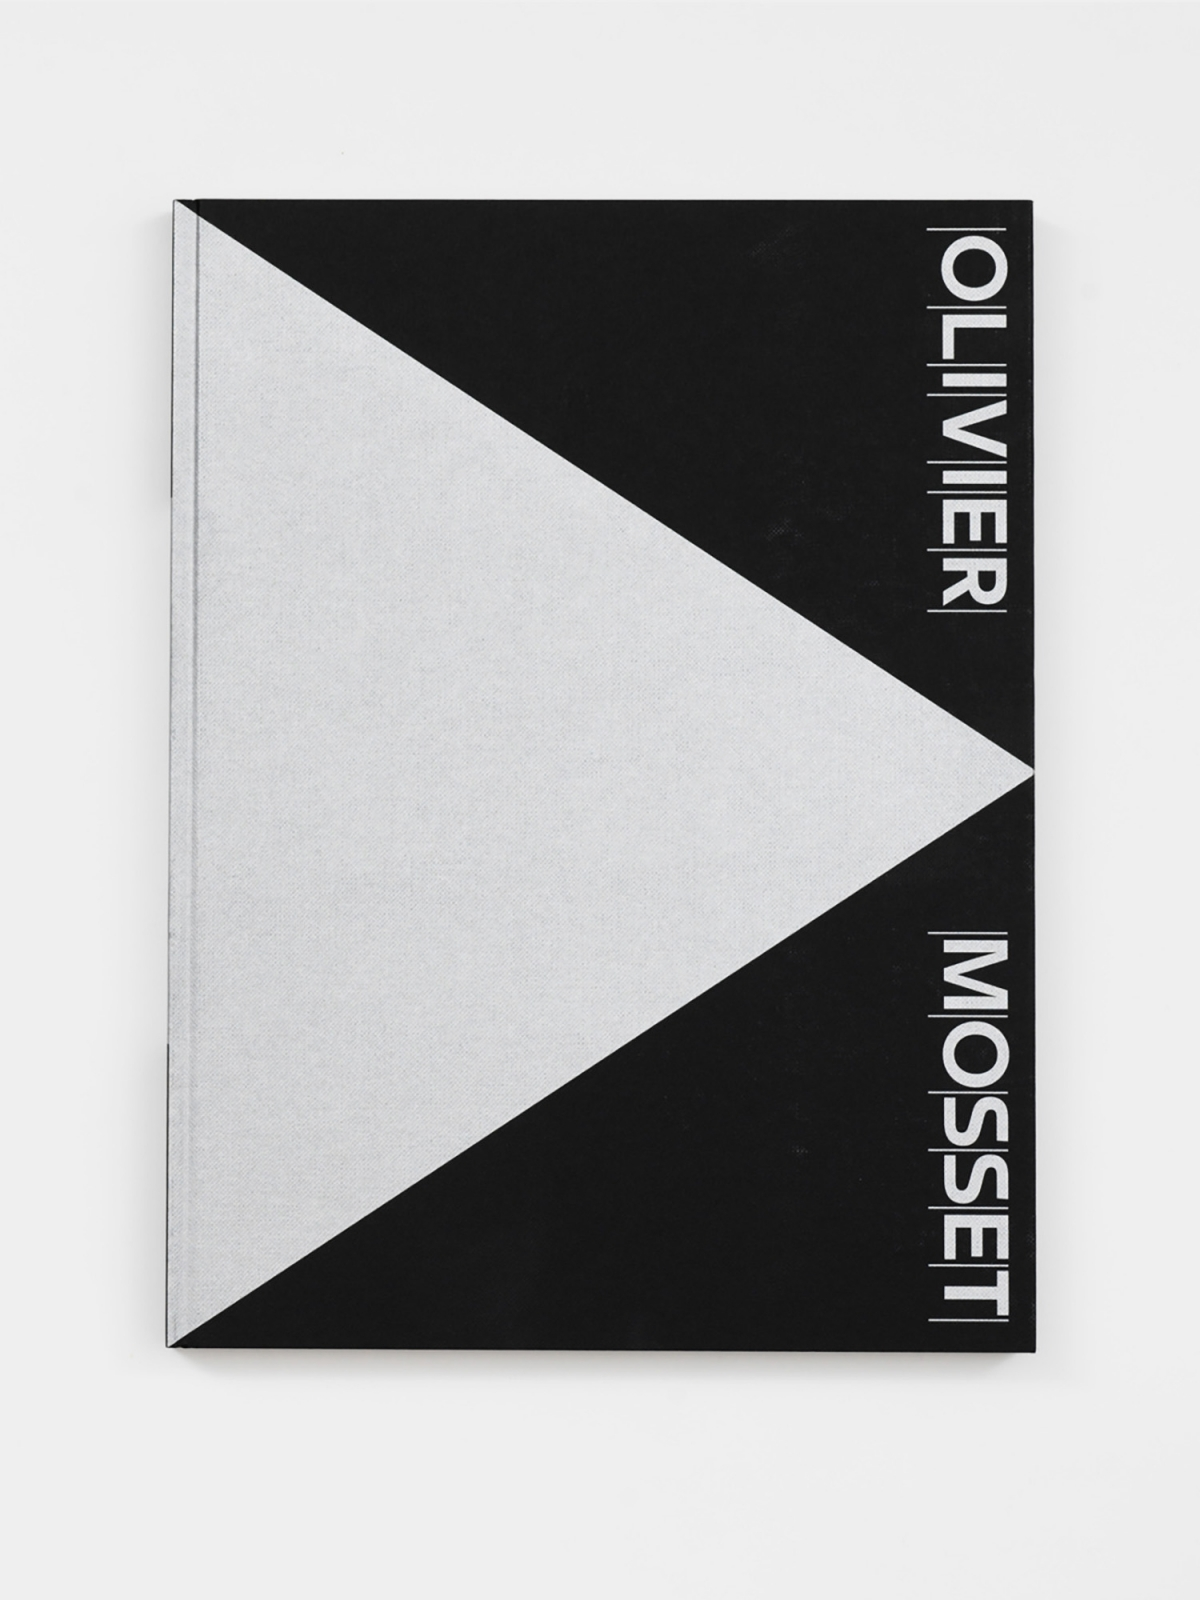 Olivier Mosset (Version anglaise)